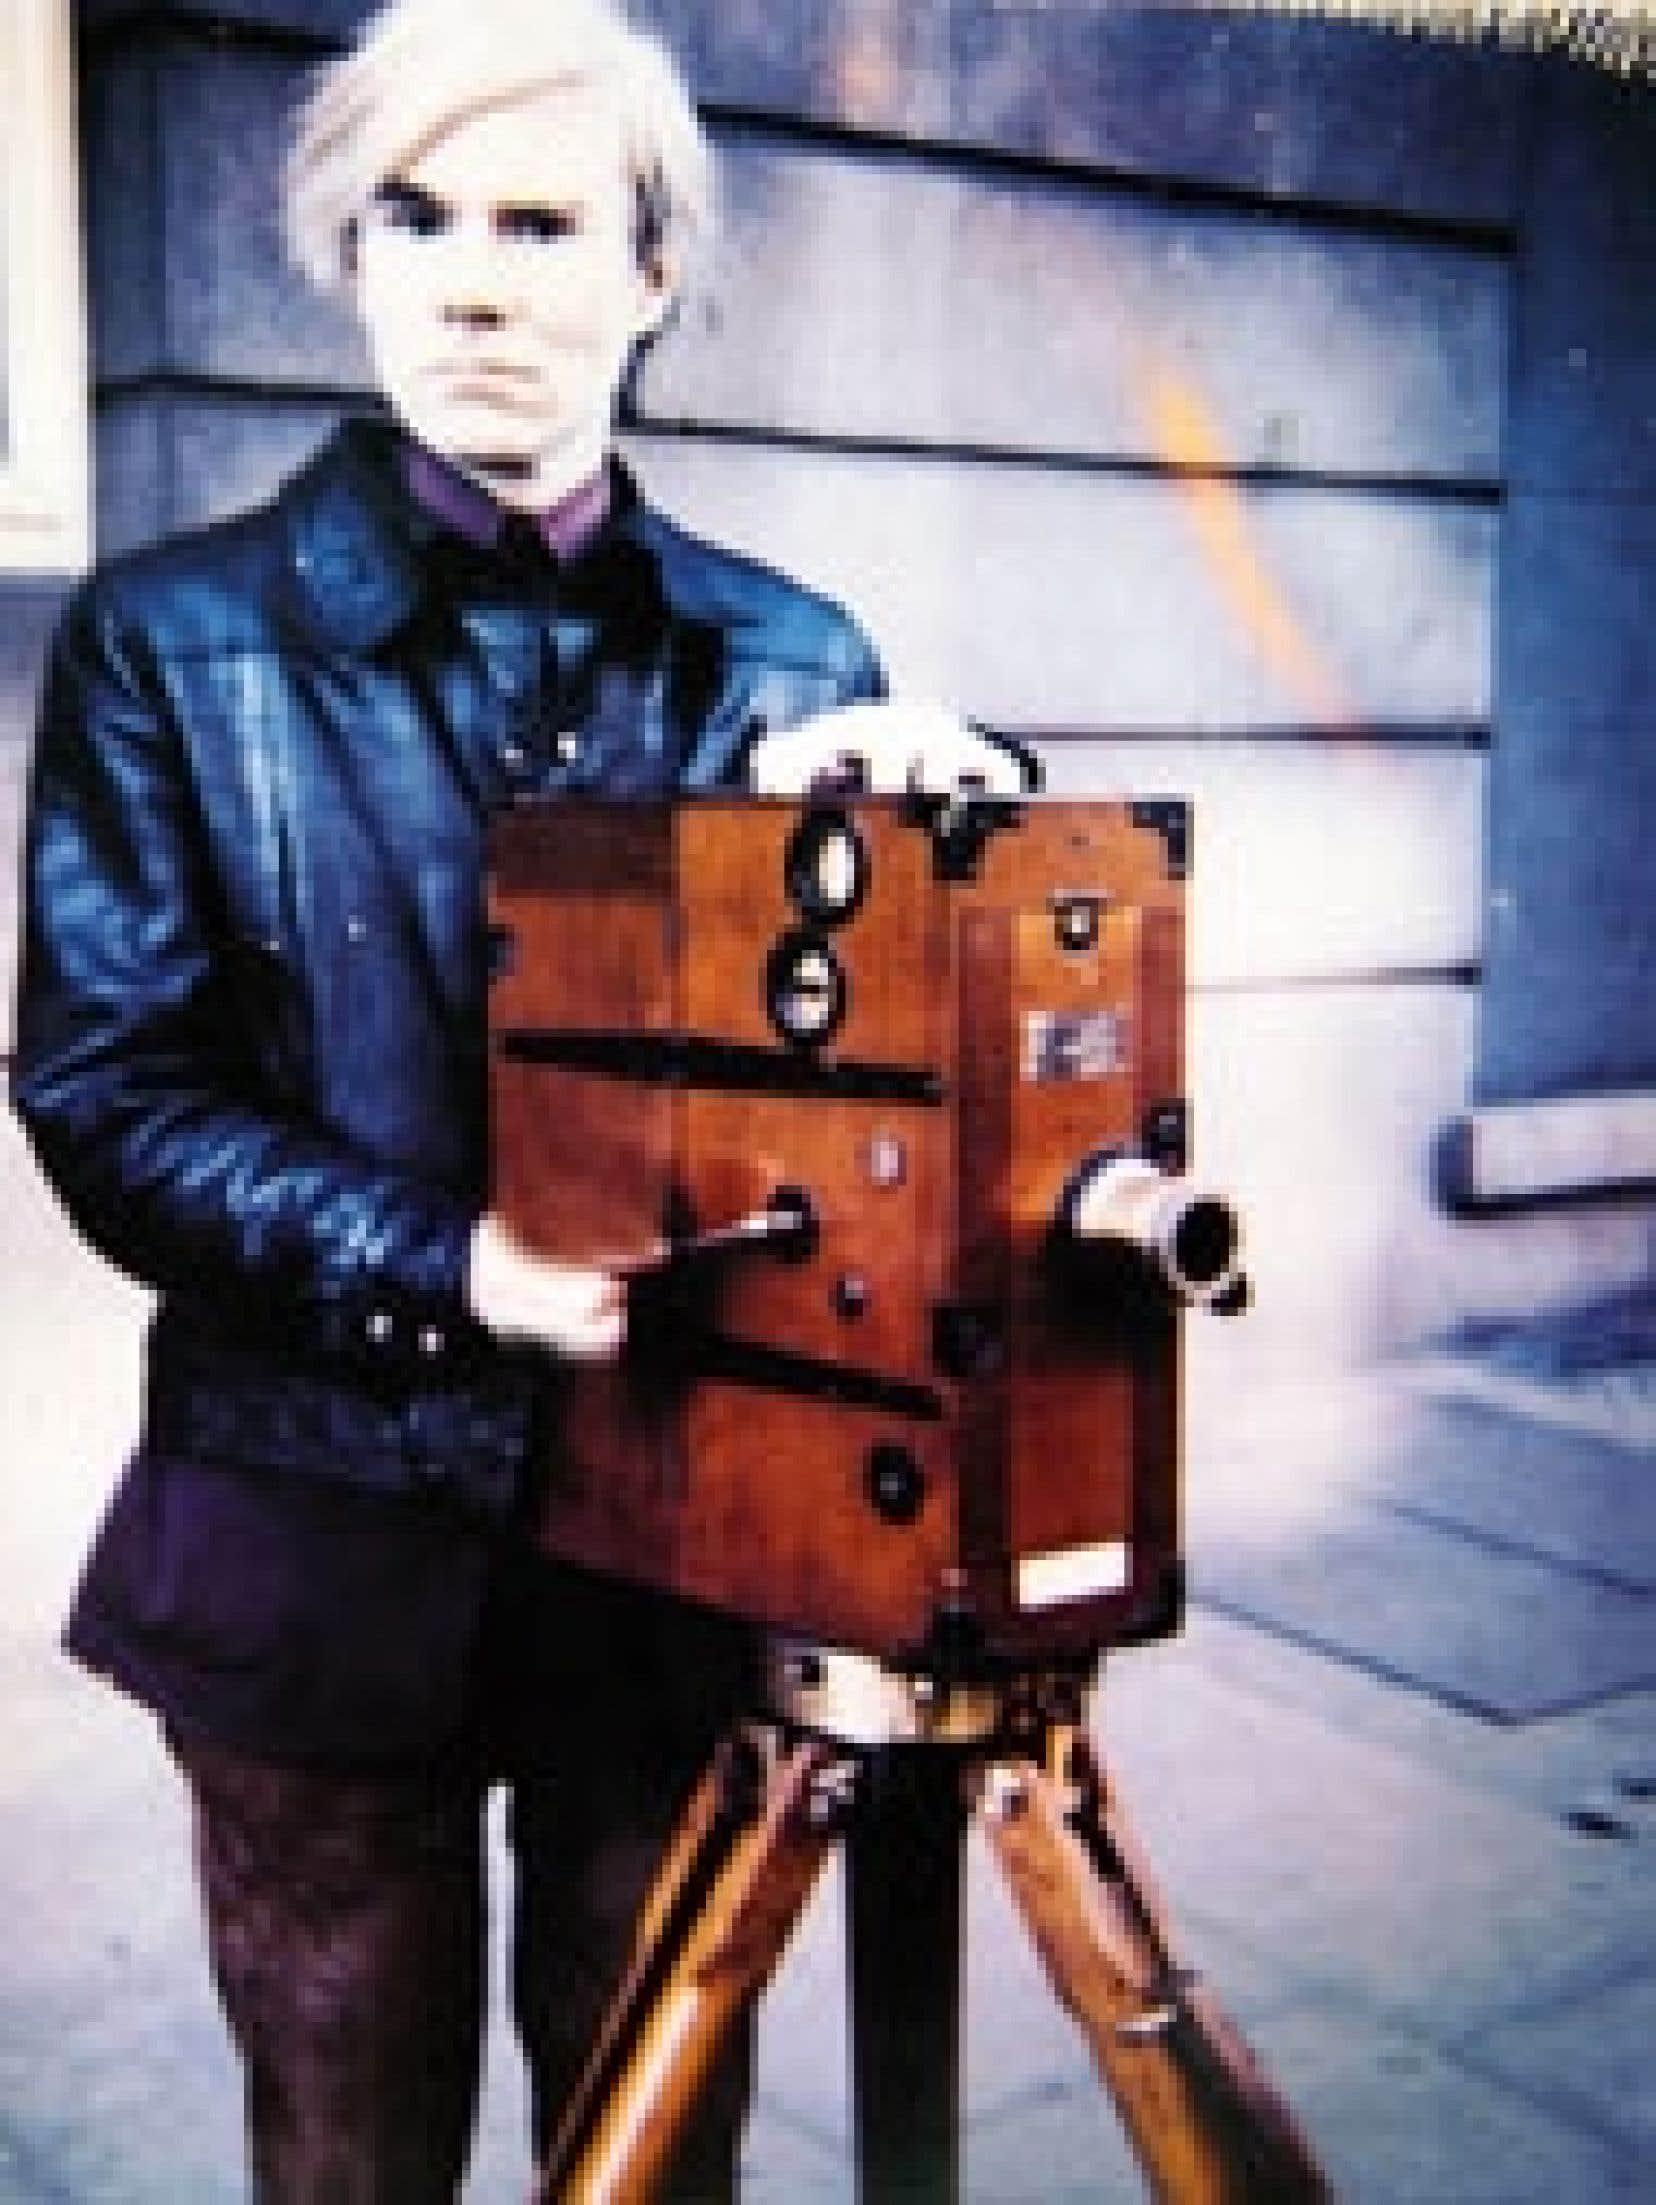 Polaroïd de Warhol avec une vieille caméra, 1960. Source: Phaidon